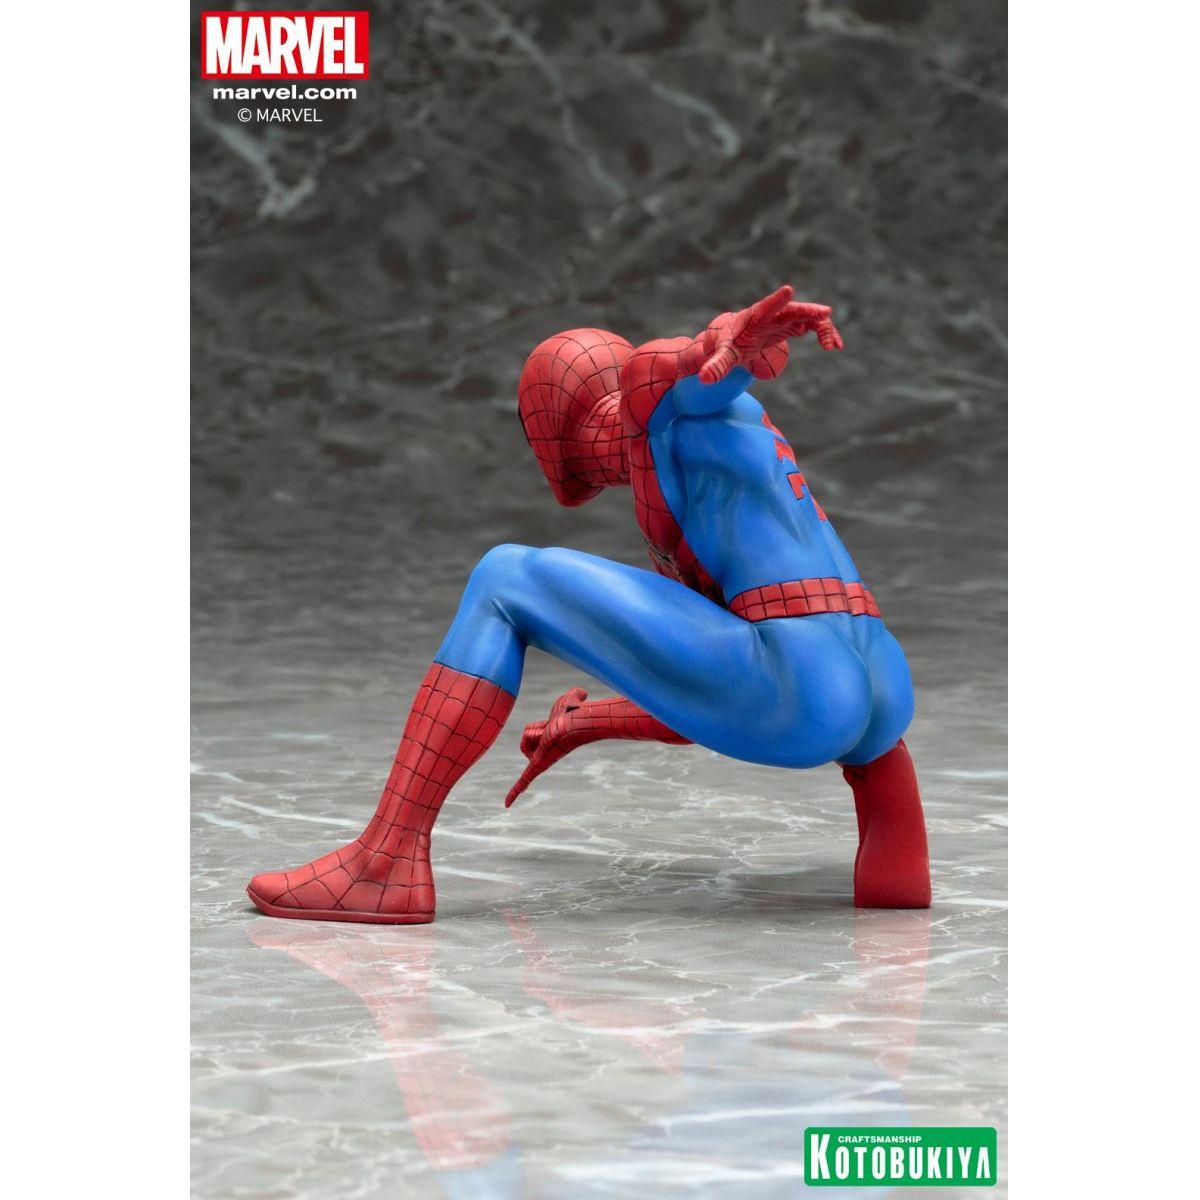 Estátua Homem-Aranha (Spider-Man): The Amazing Spider-Man ArtFX+ Statue Escala 1/10 - Kotobukiya